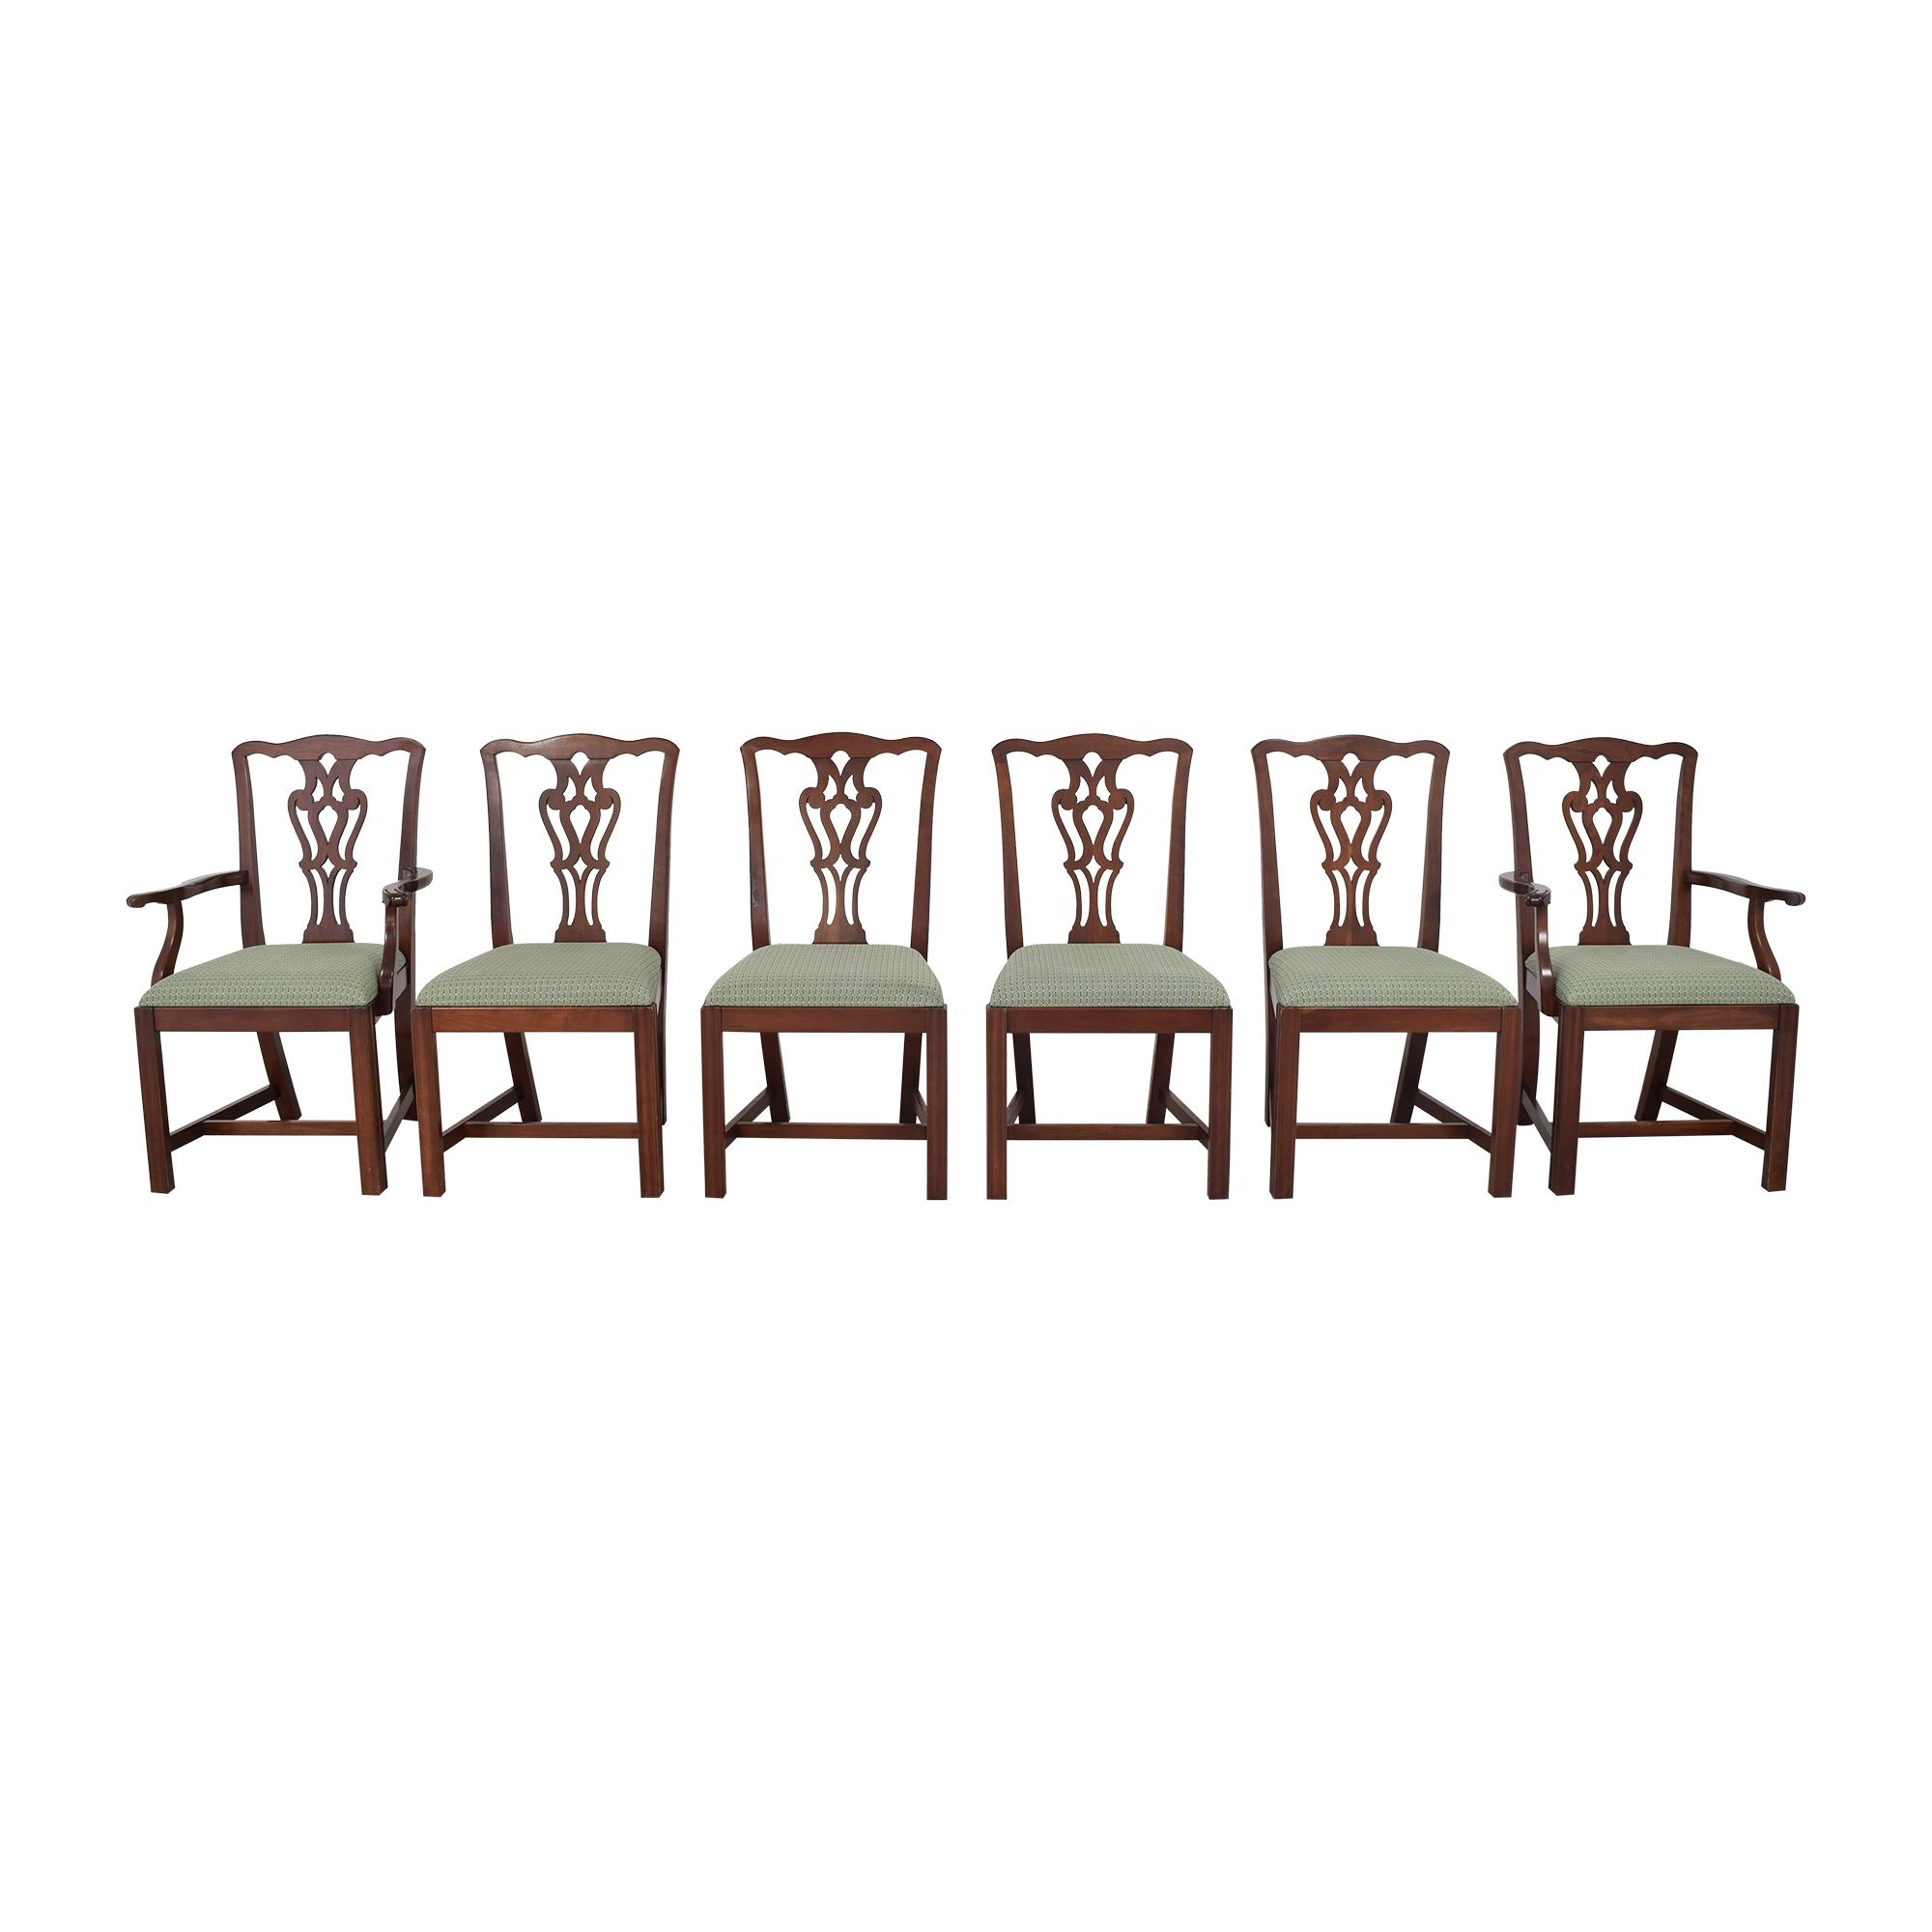 Pennsylvania House Pennsylvania House Dining Chairs ct